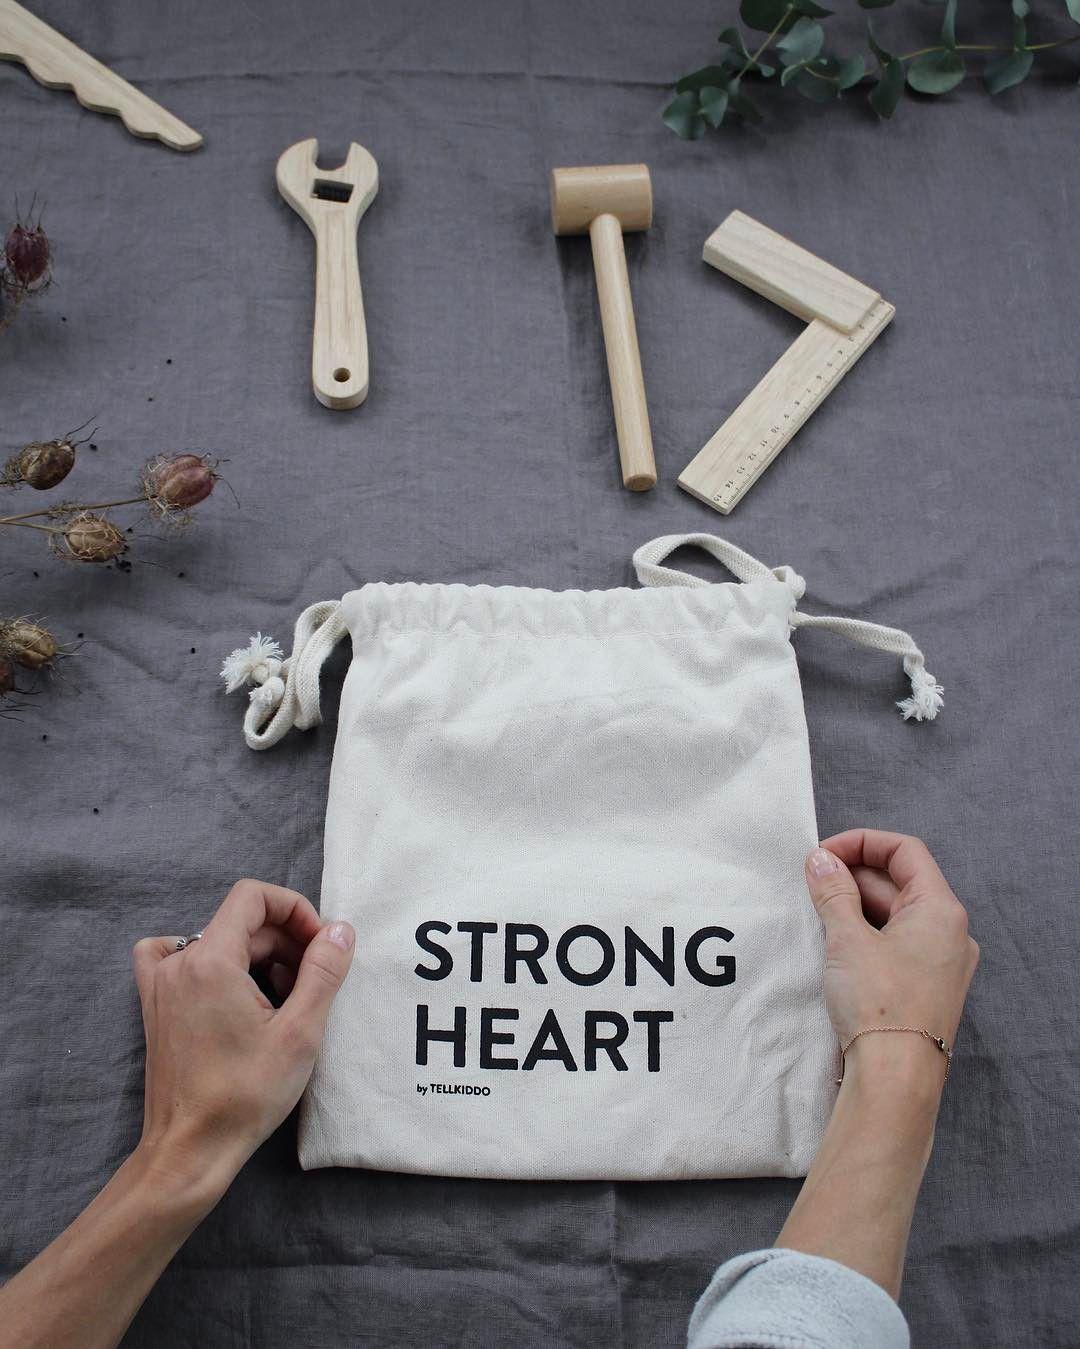 Tellkiddo 瑞典可愛圖案帆布收納袋 STRONG HEART 1